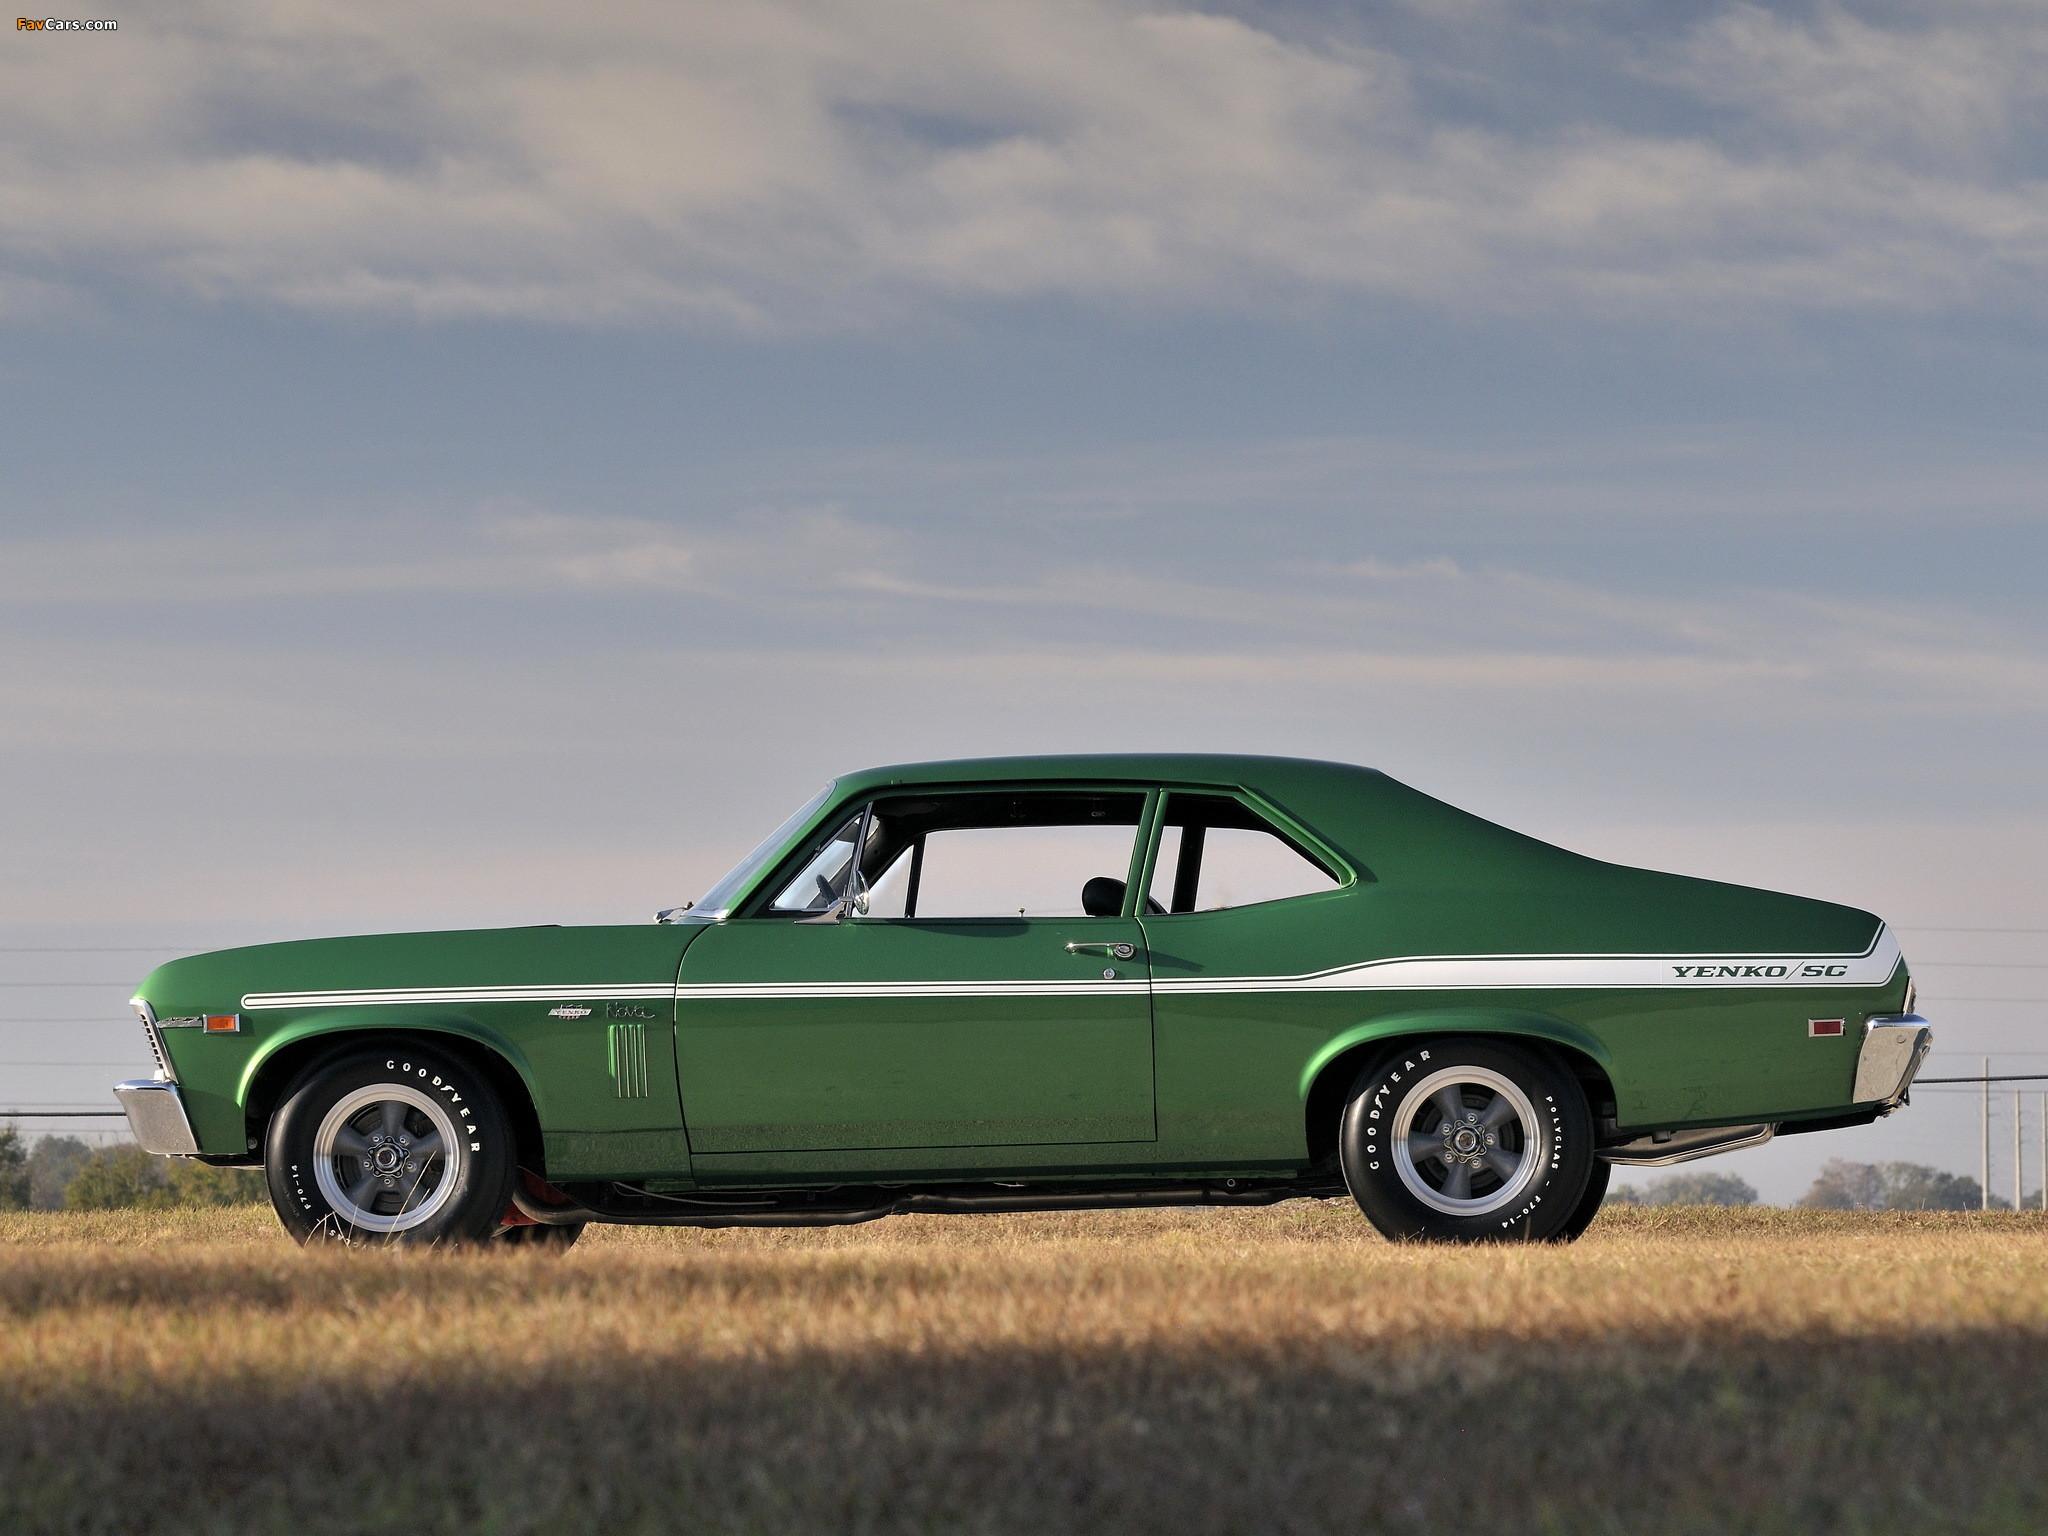 Chevy Nova Wallpaper X Free Download on 1967 Chevy Nova Pro Touring